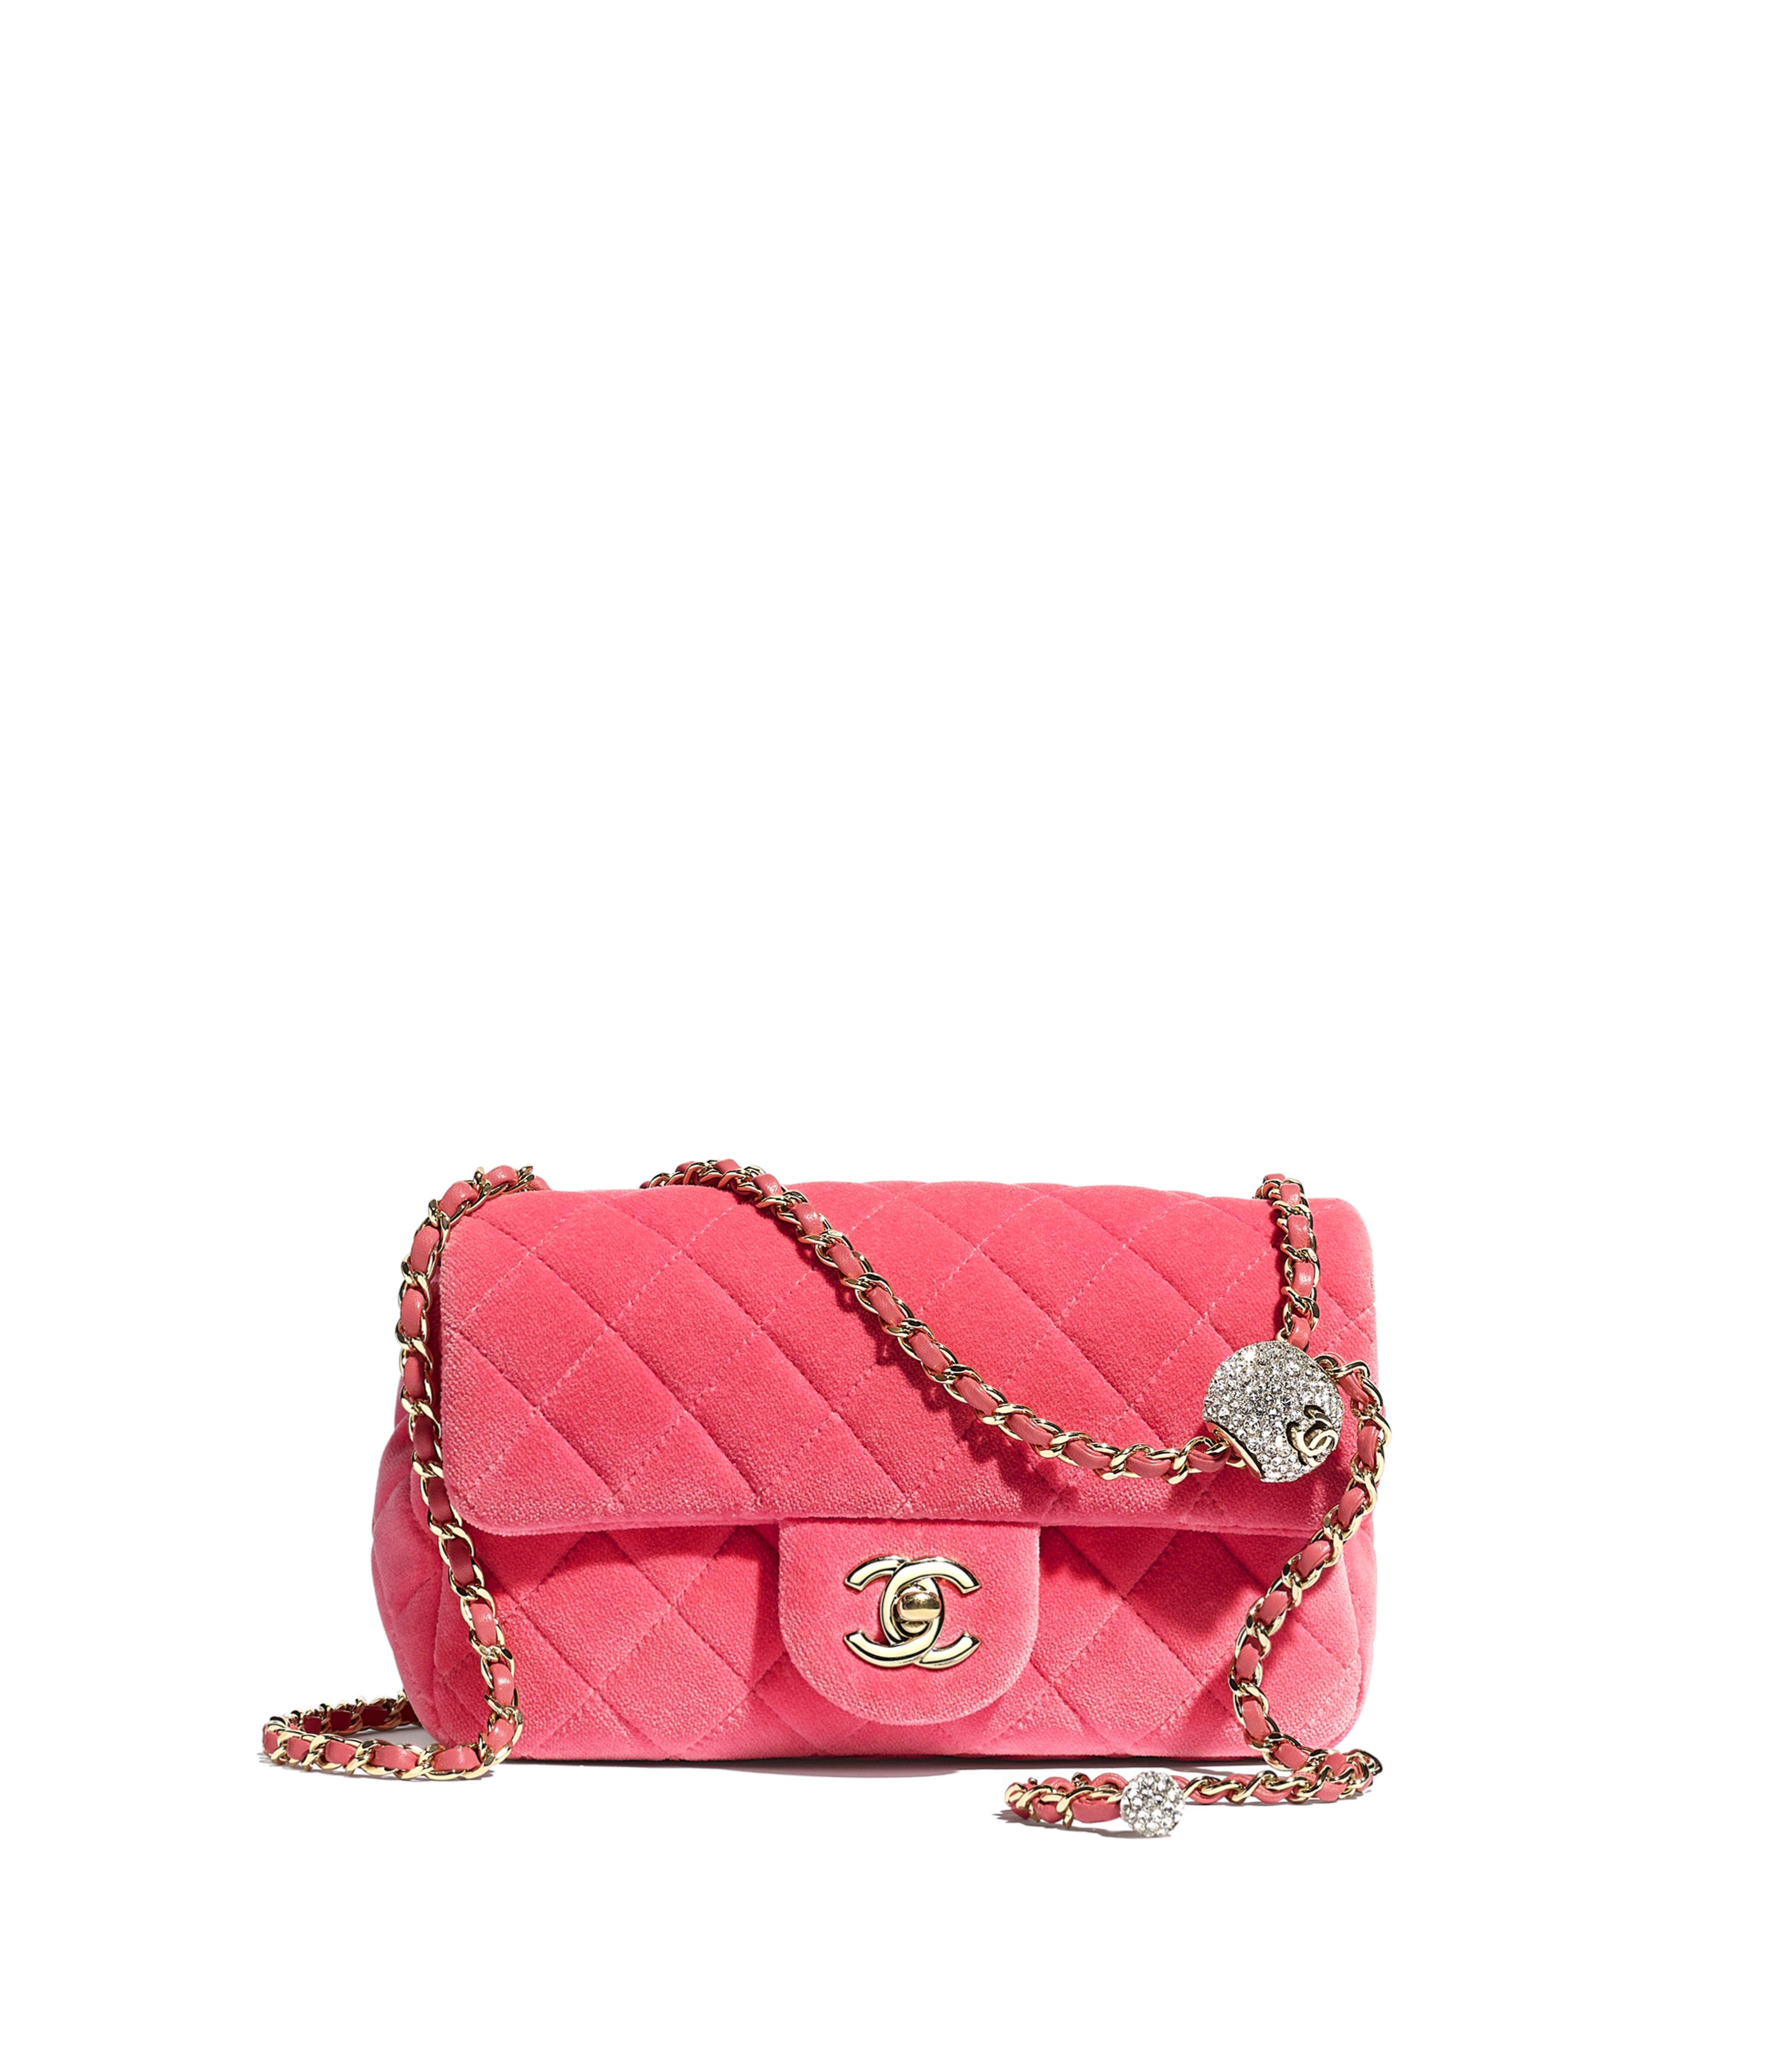 Borse Chanel Outlet Italia.Borse Moda Chanel